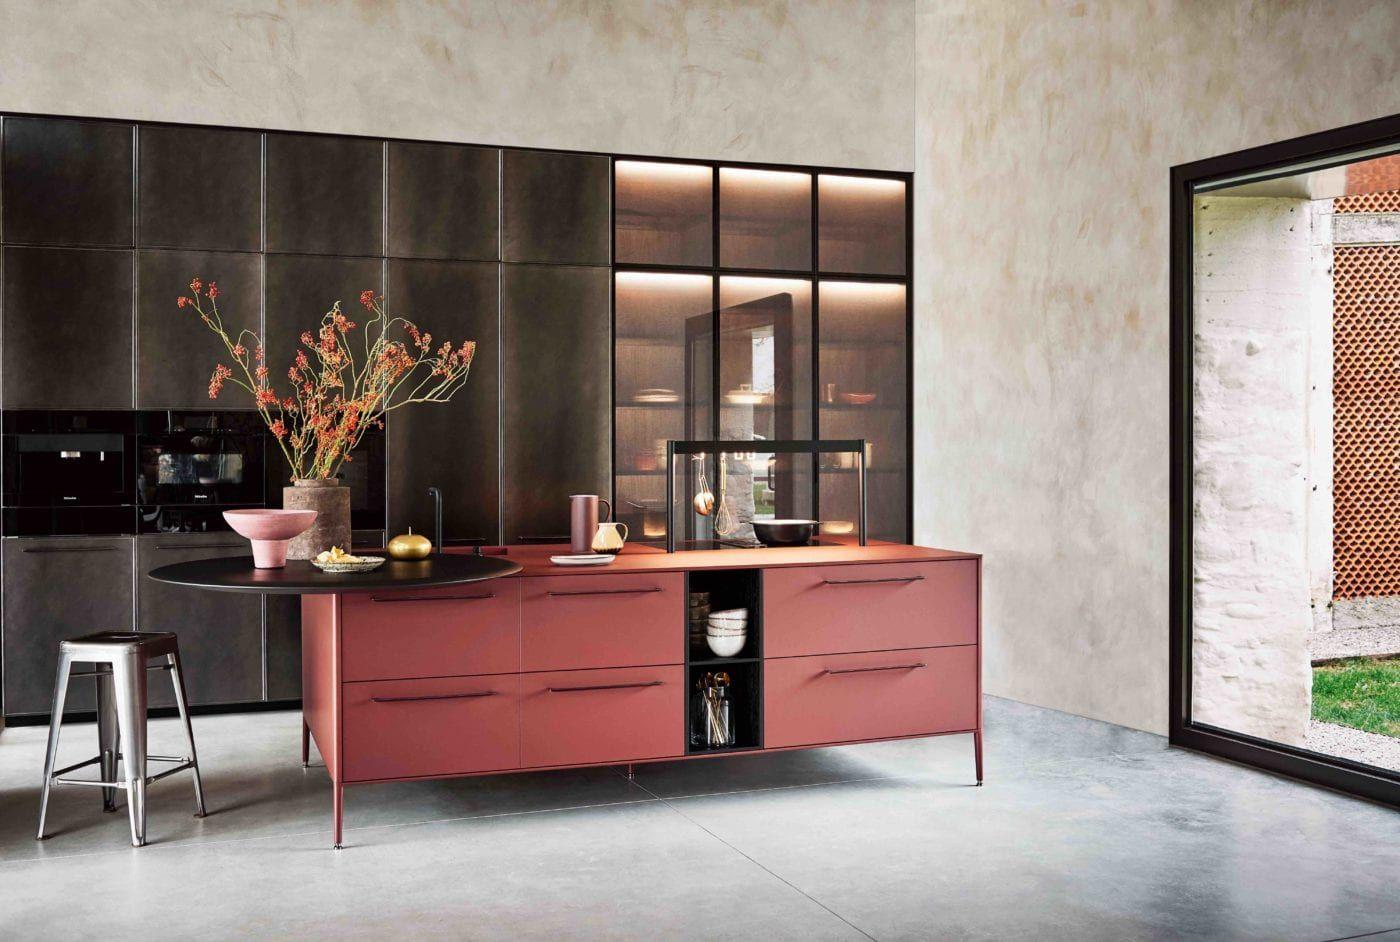 Cesar Unit Modern Kitchen Design De Cozinha Moderna Decorar Cozinha Cozinhas Modernas